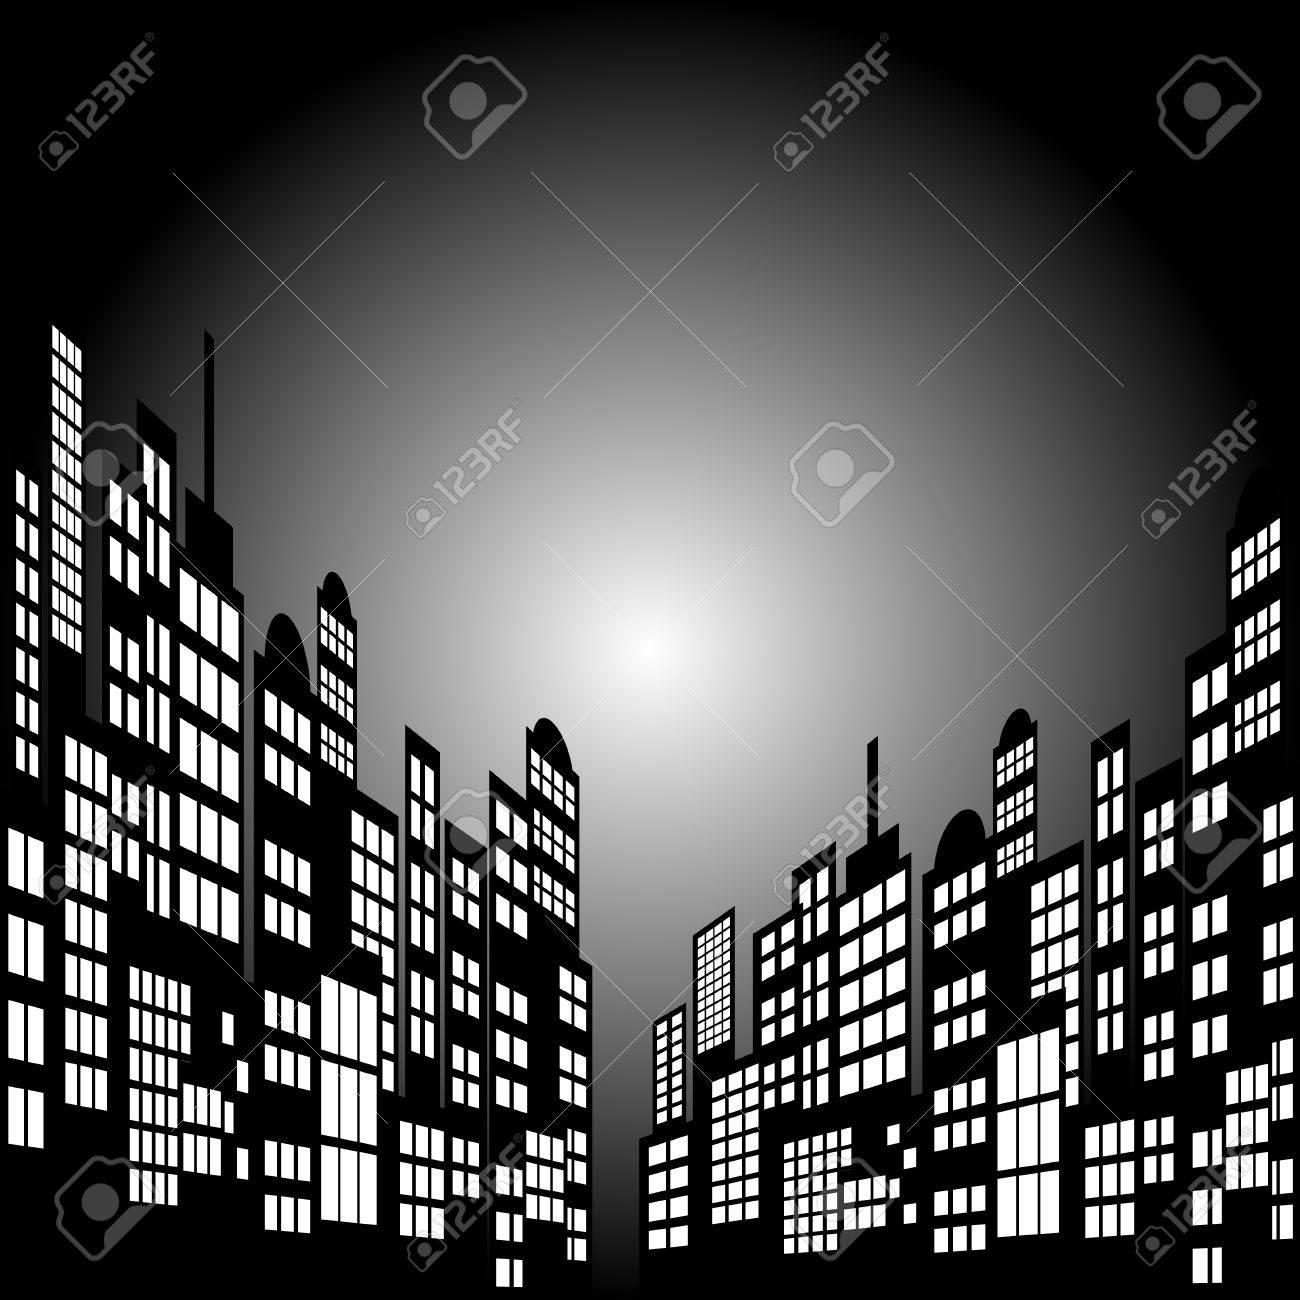 Style Cartoon Night City Skyline Background. - 60580695